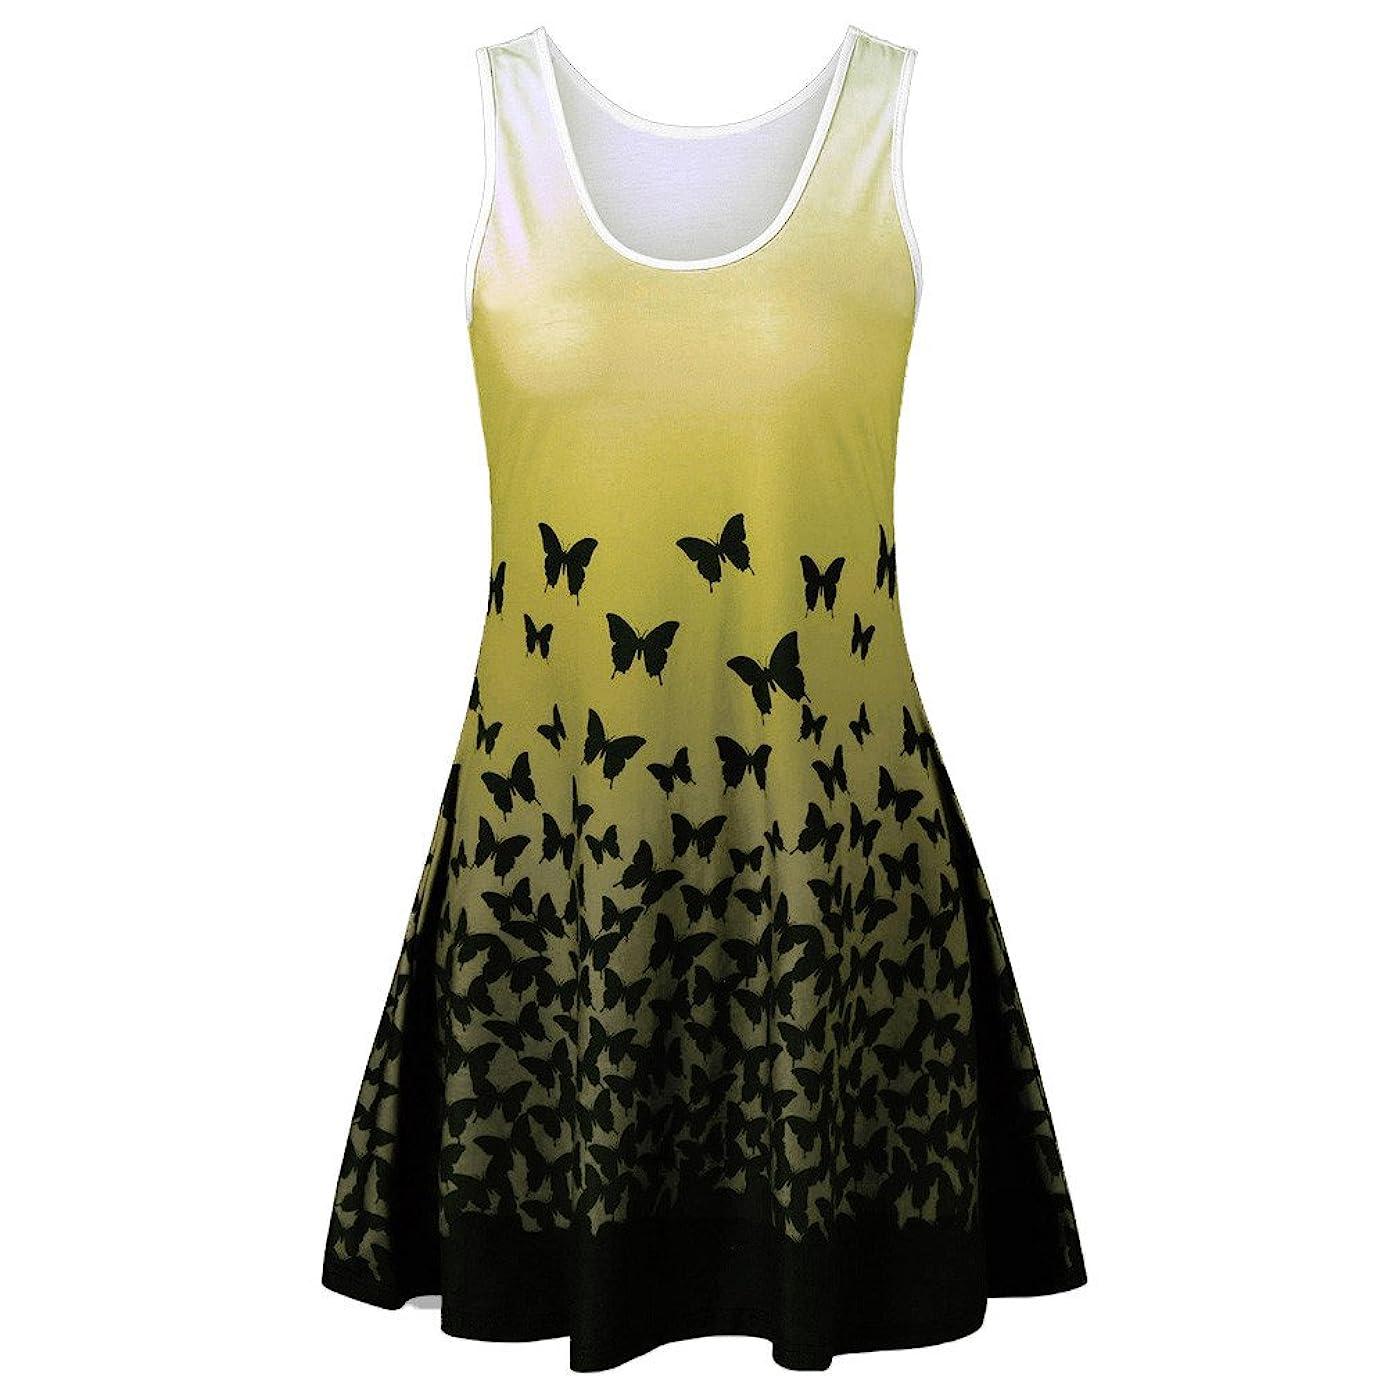 Ghazzi Women Dresses Casual Printed Mini Dress Tunic Top Sleeveless Party Swing Dress Vintage Sundress Beach Dress